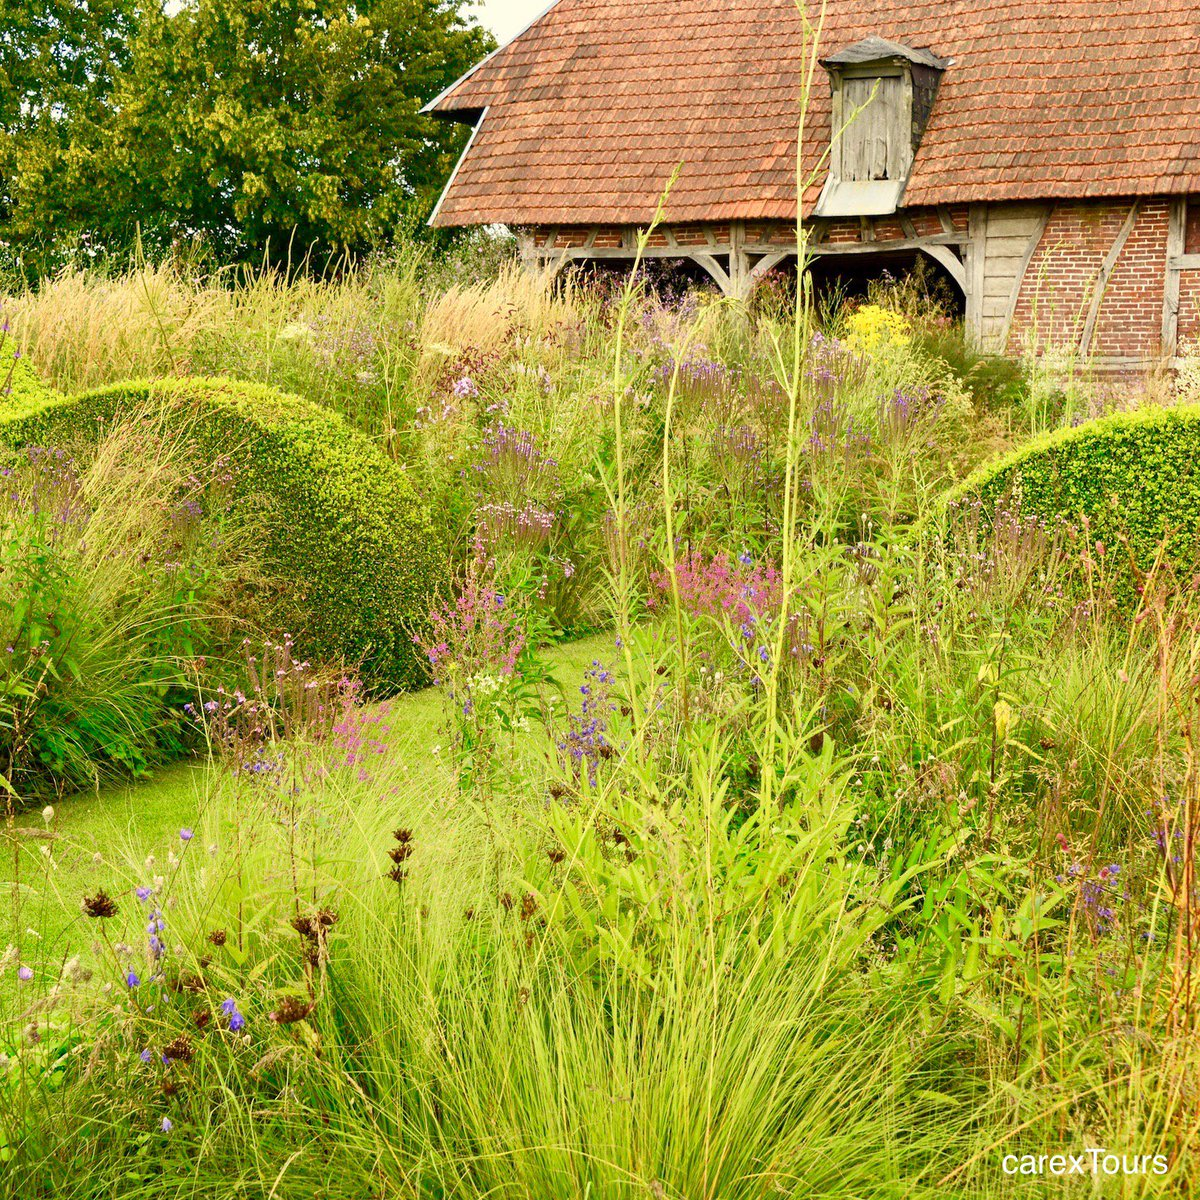 gardensofnormandy tour for garden savvy lejardinplume travelers gardendesign landscapearchitecture jardin carextours